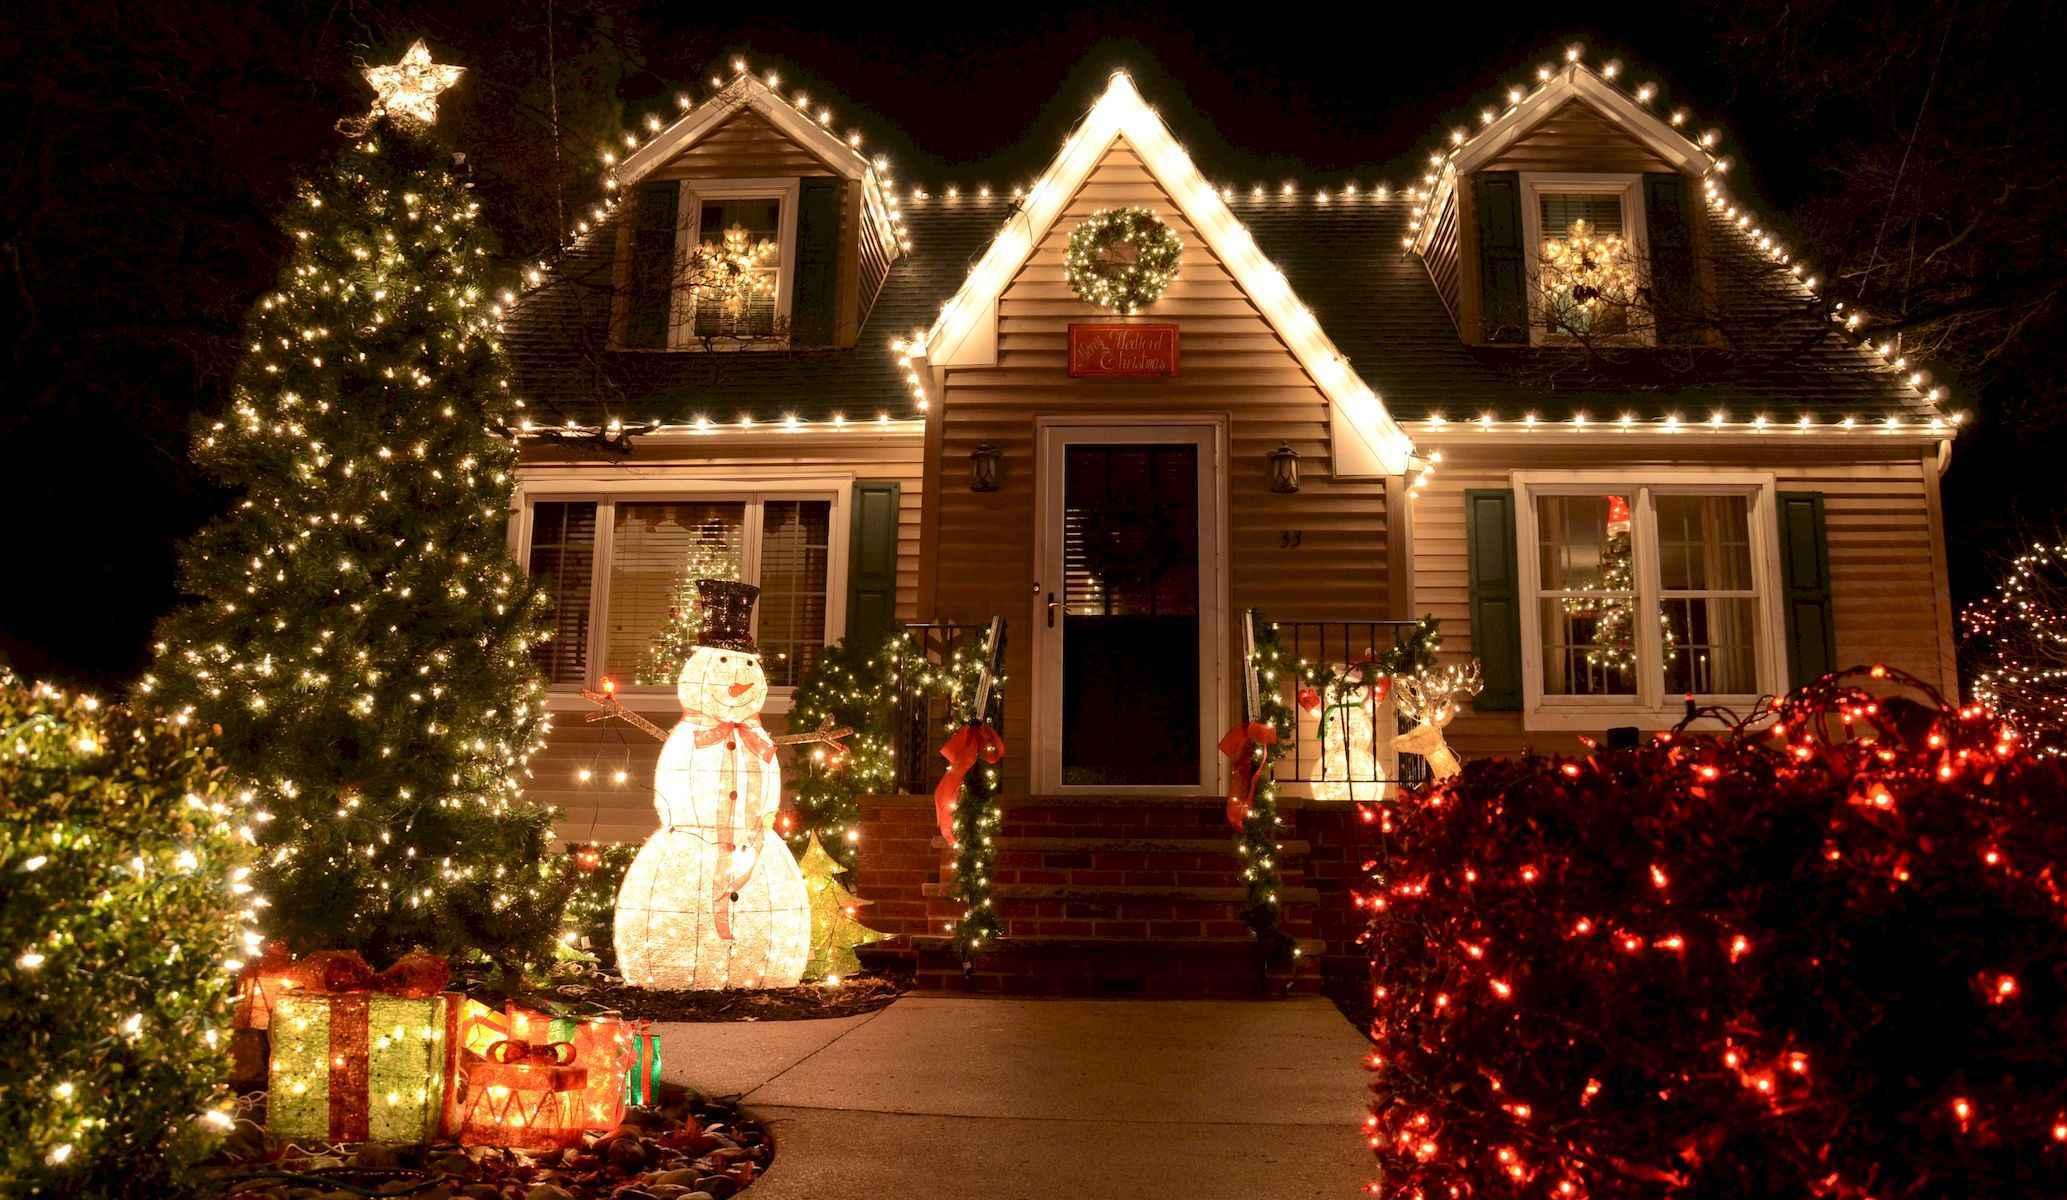 40 amazing outdoor christmas decorations ideas (35)